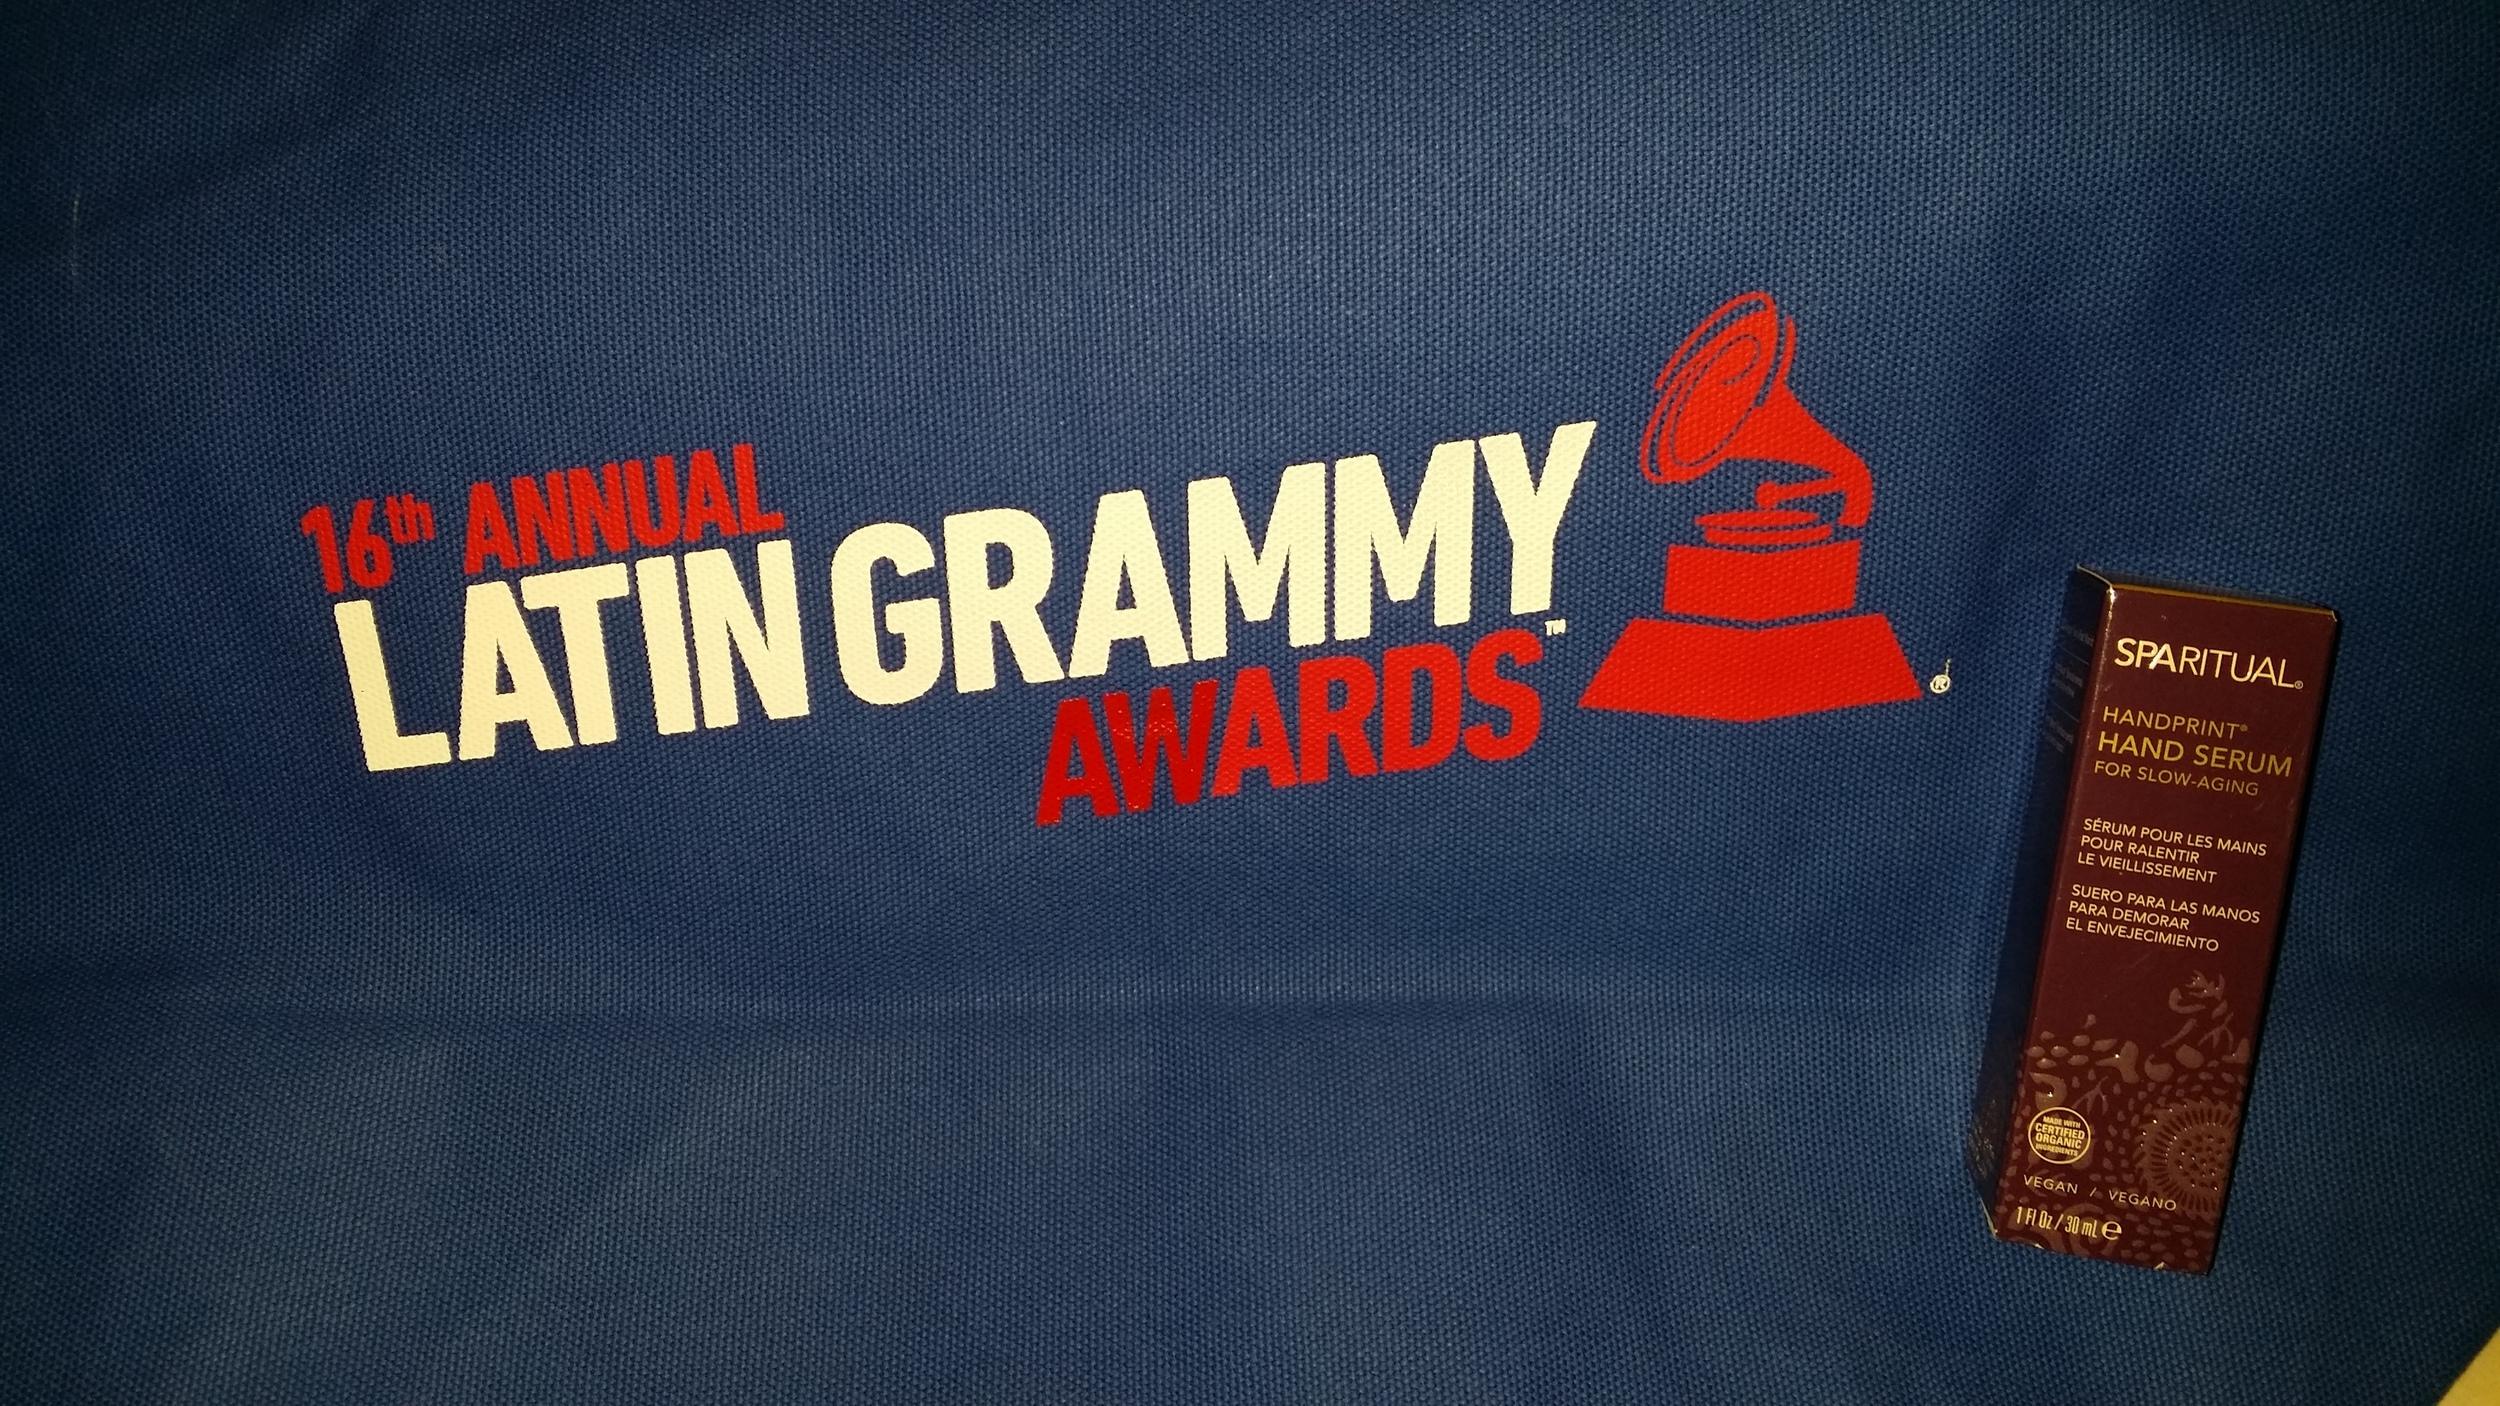 Spa Ritual Latin Grammys 2015.jpg